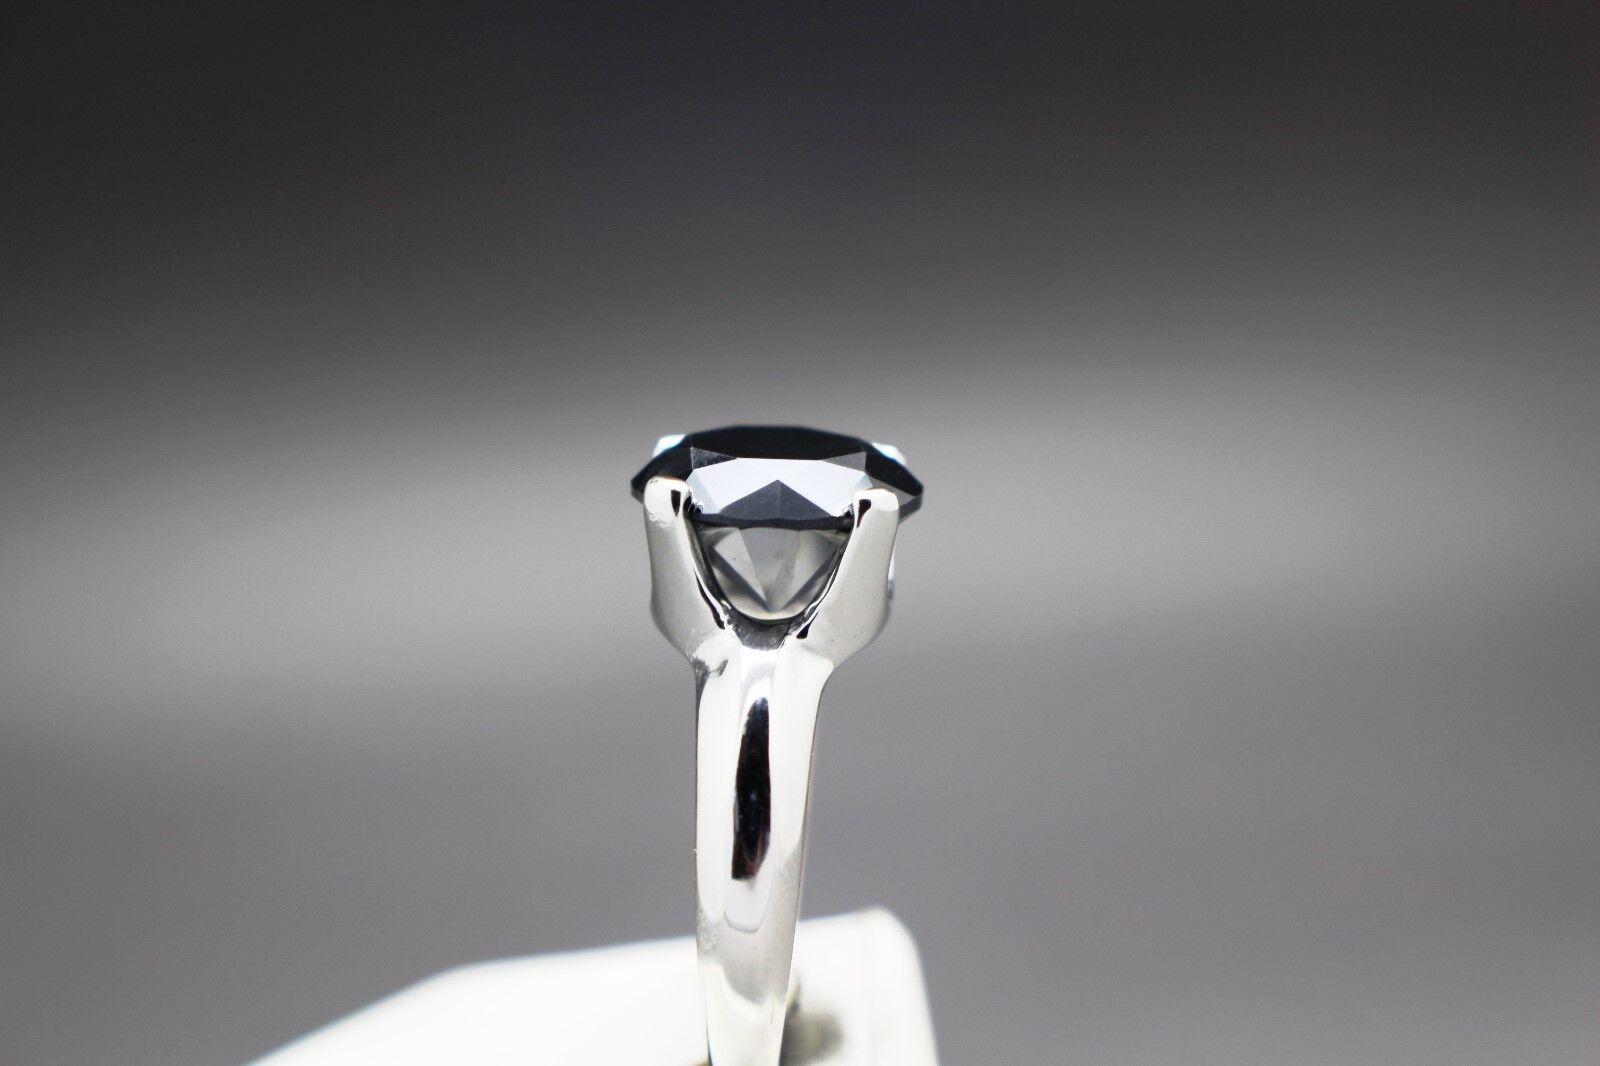 3.18cts 10.06mm Real Natural Black Diamond Ring AAA Grade 1790 Value. - $199.95